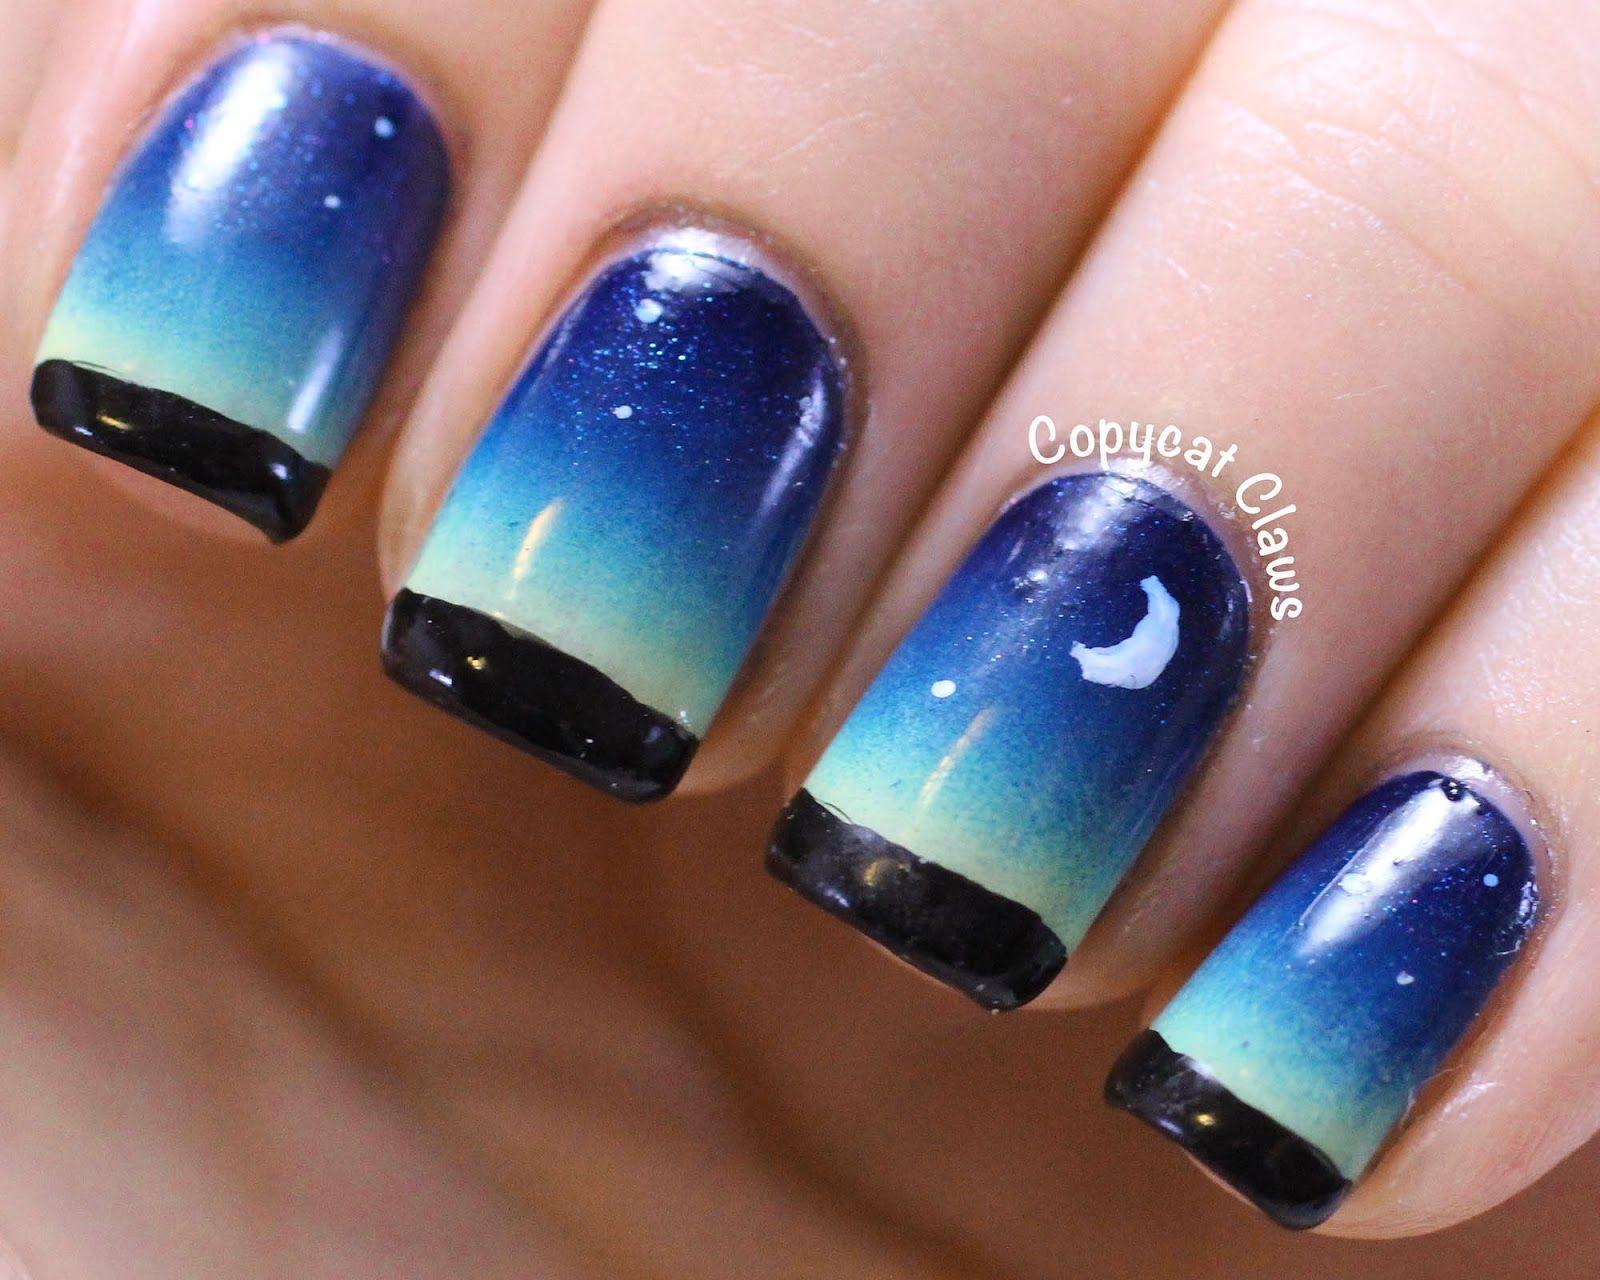 Copycat Claws: Night Sky Nail Art | nails | Pinterest | Sky nails ...